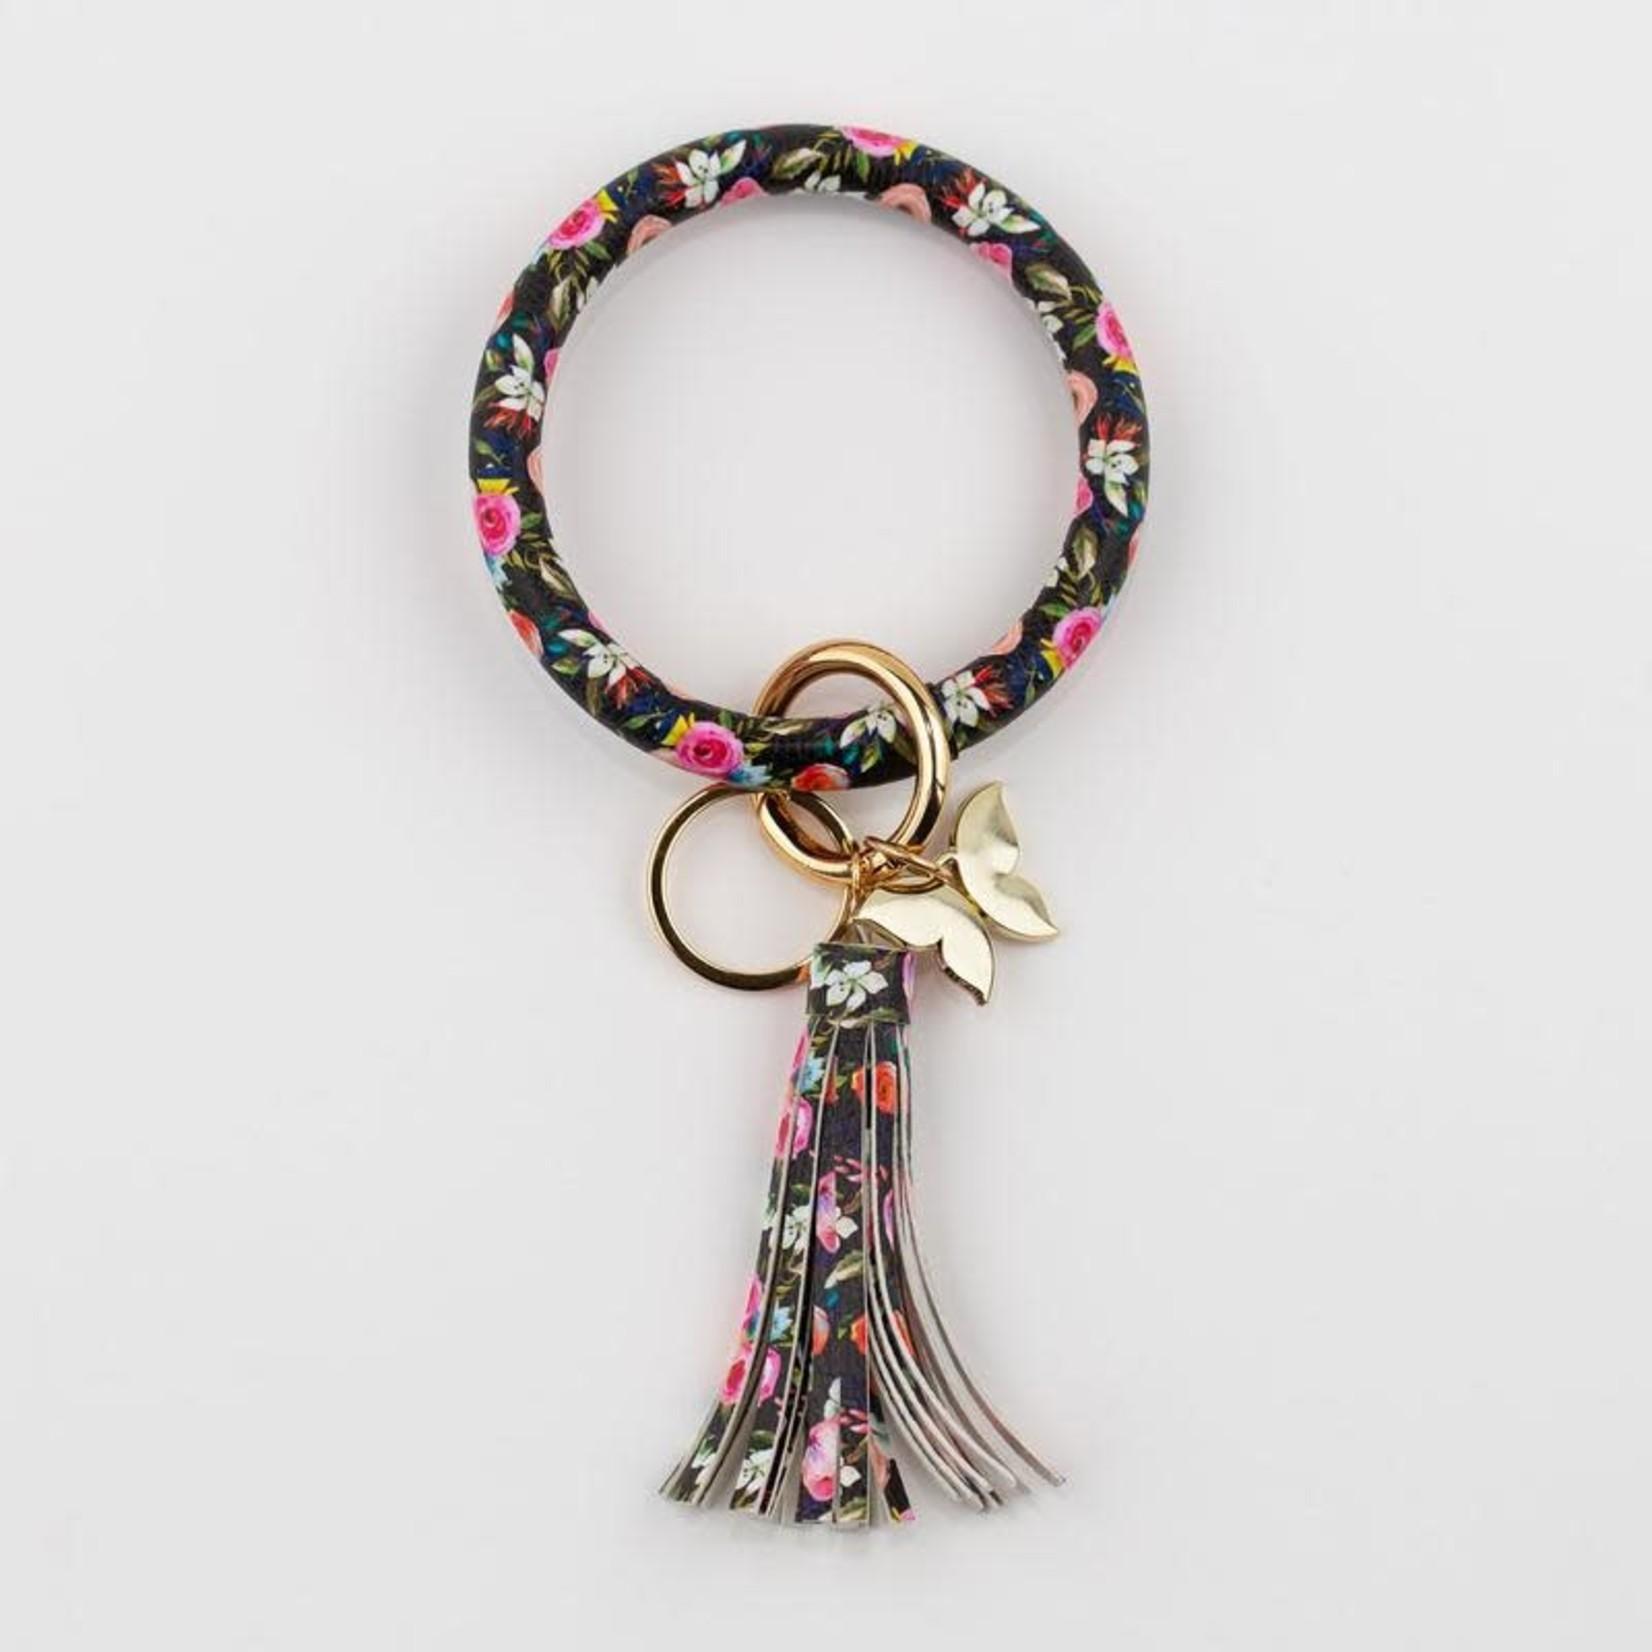 Monarque Bangle Key Ring - Floral on Black